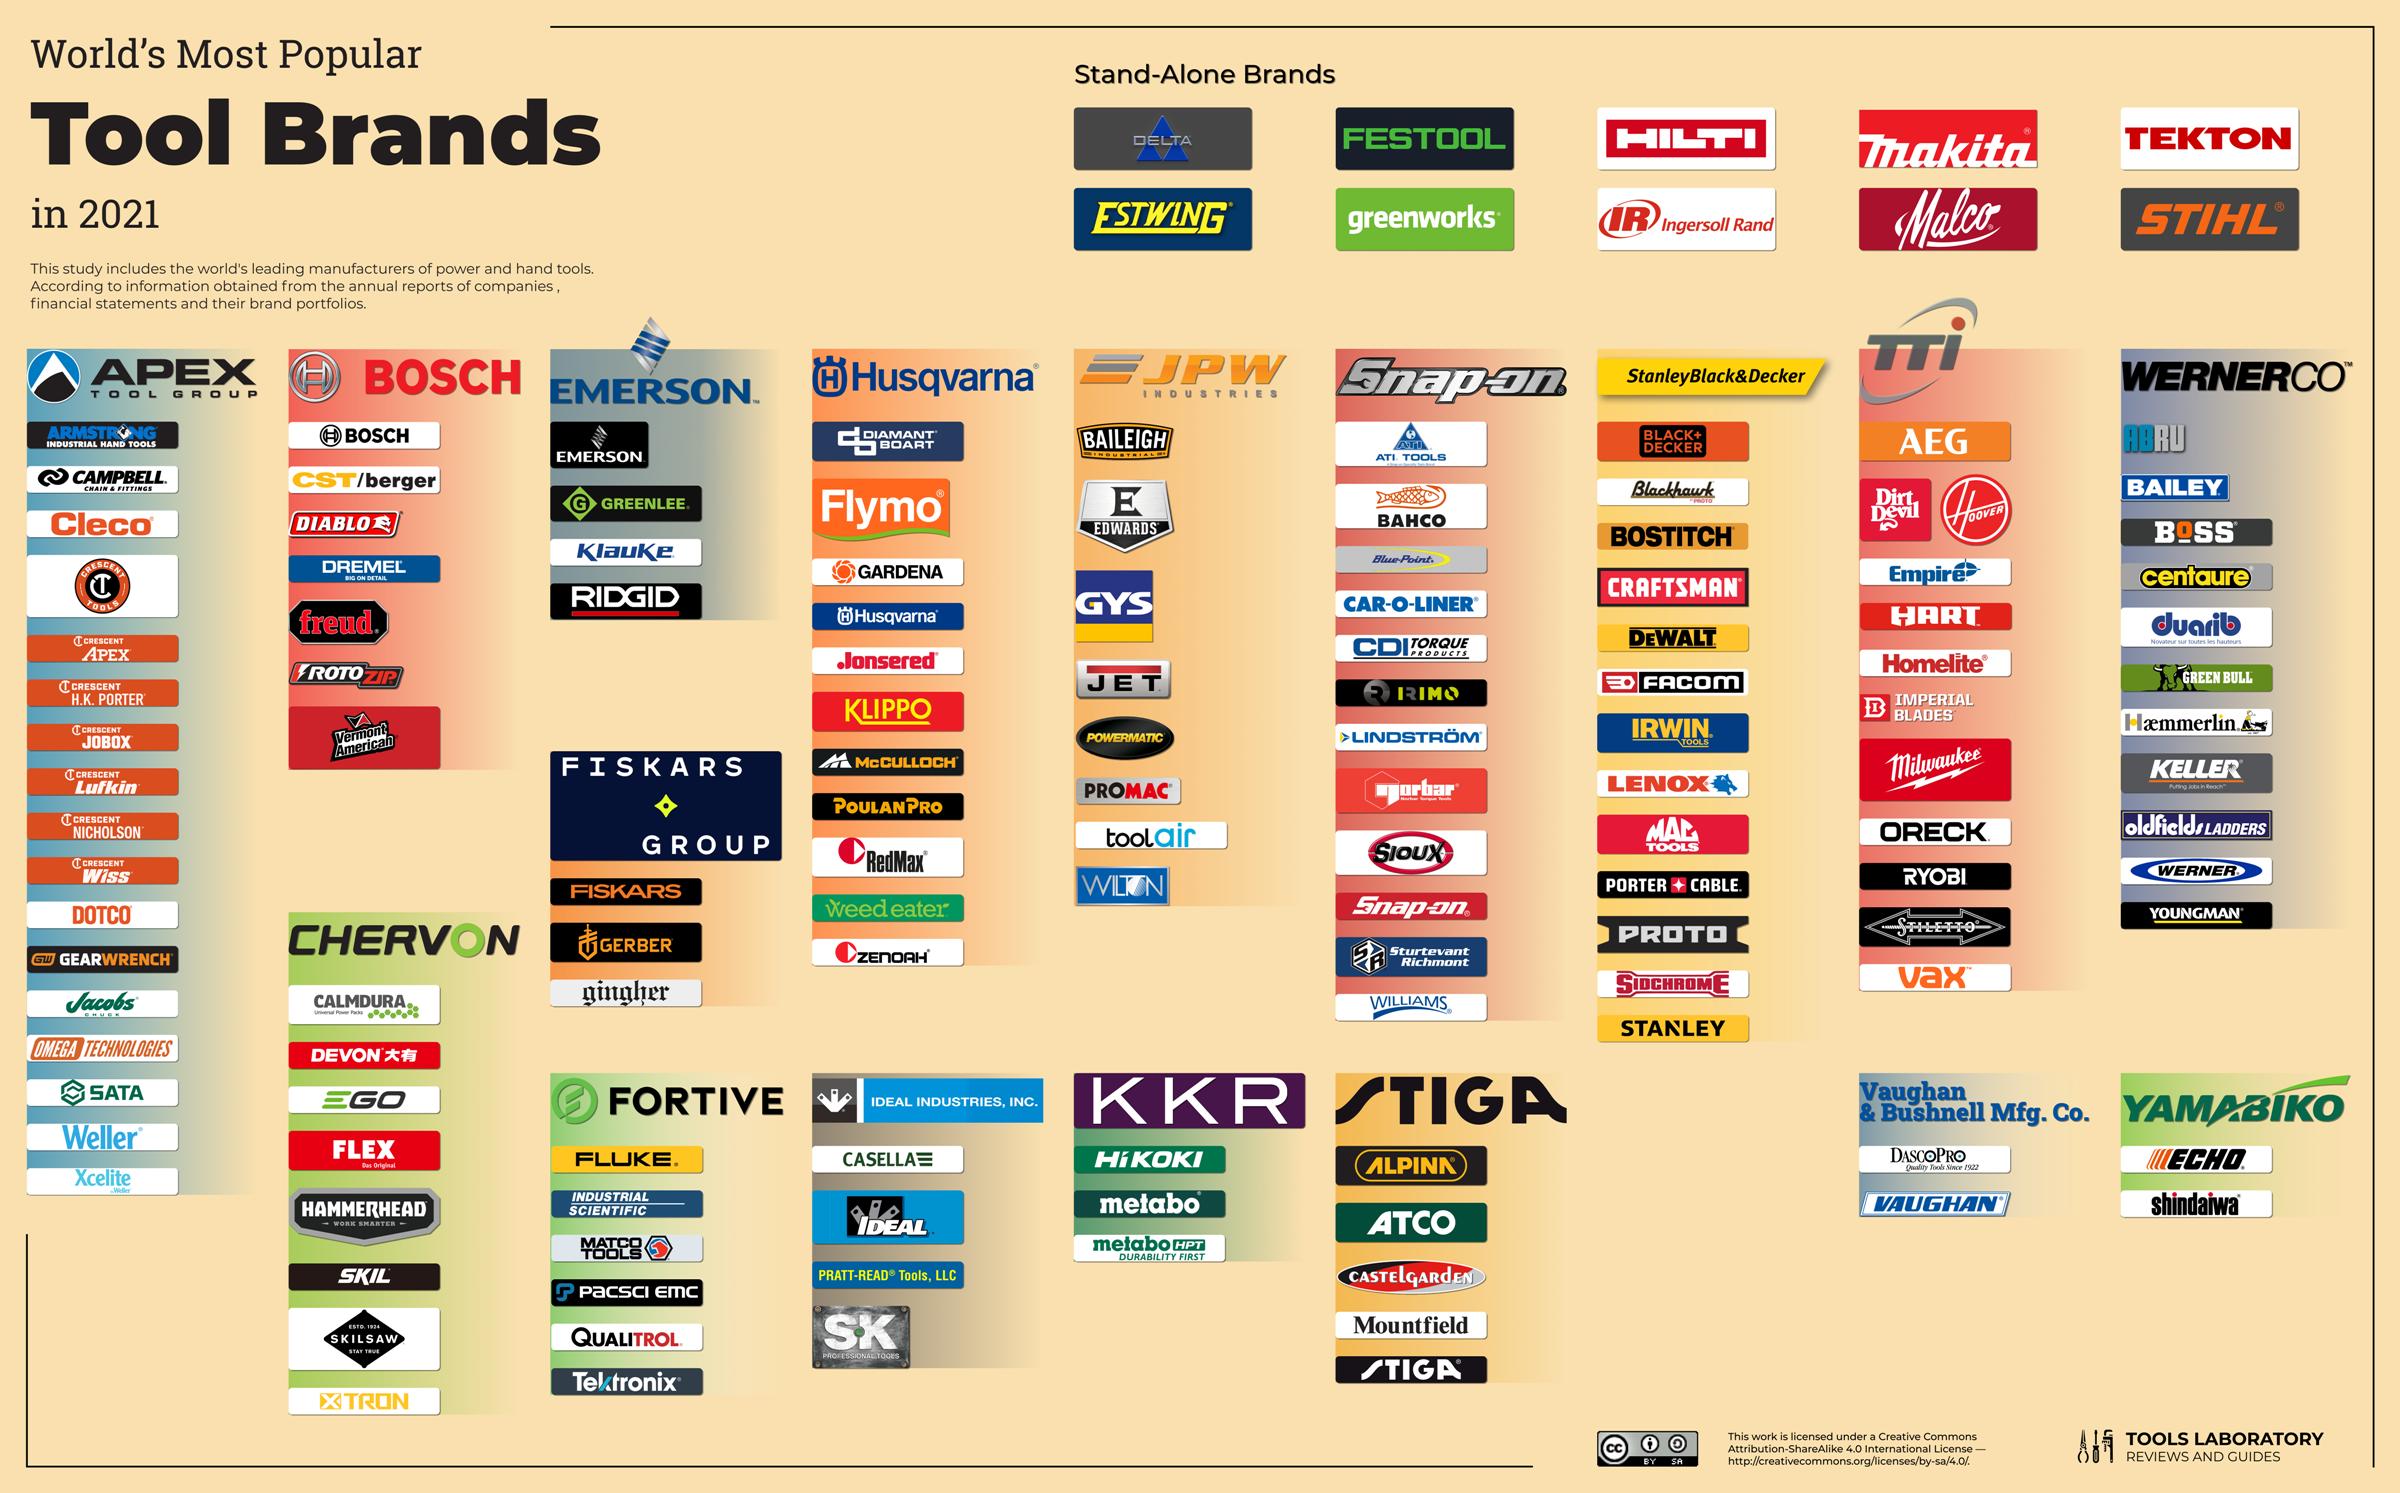 World's Most Popular Tool Brands